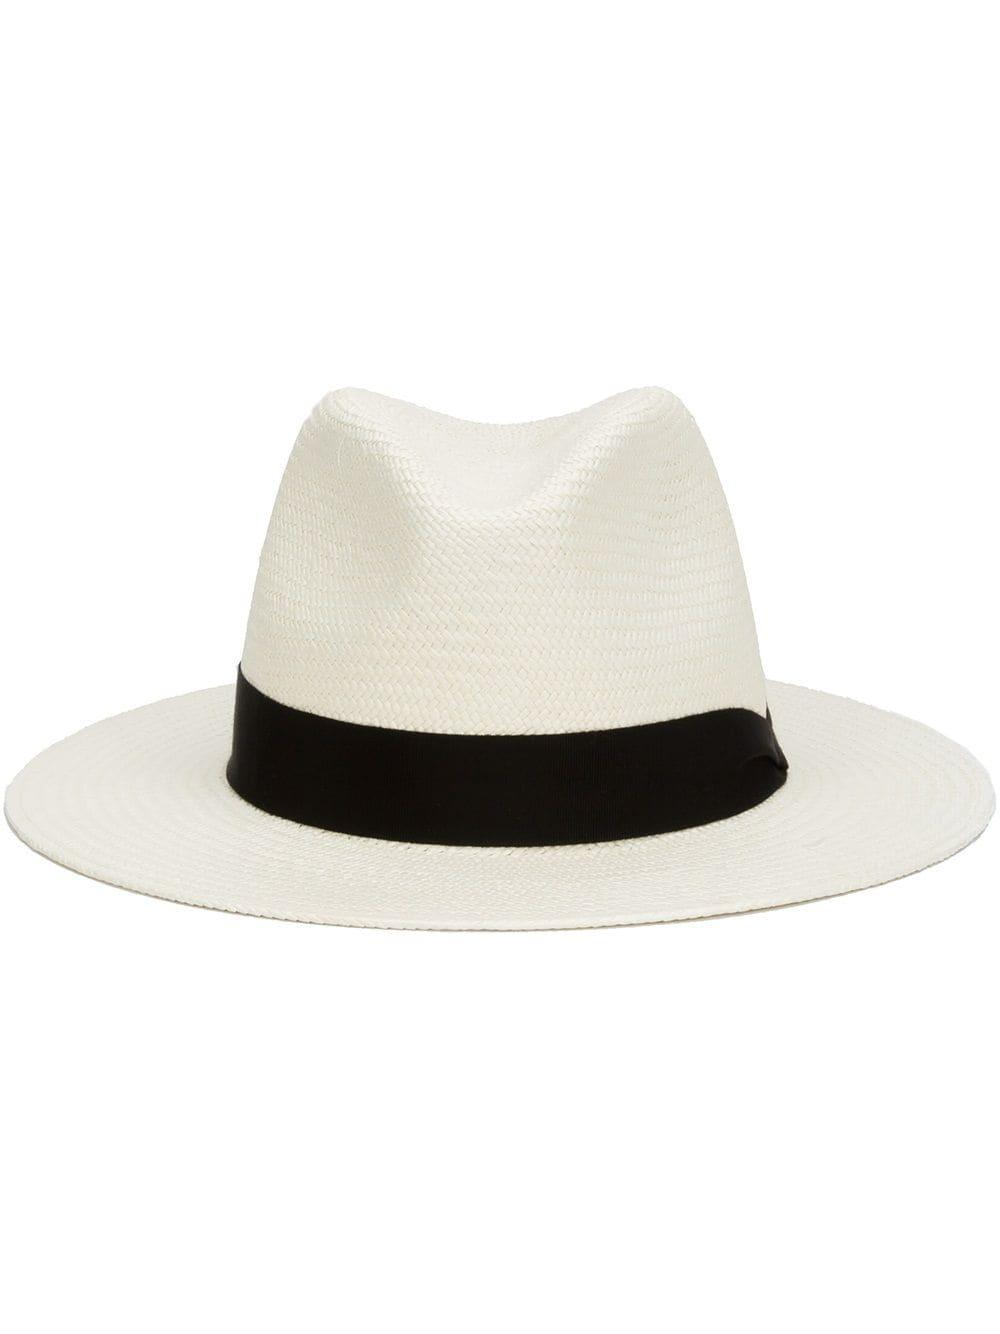 Panama Hat Item # W262181M2-S20